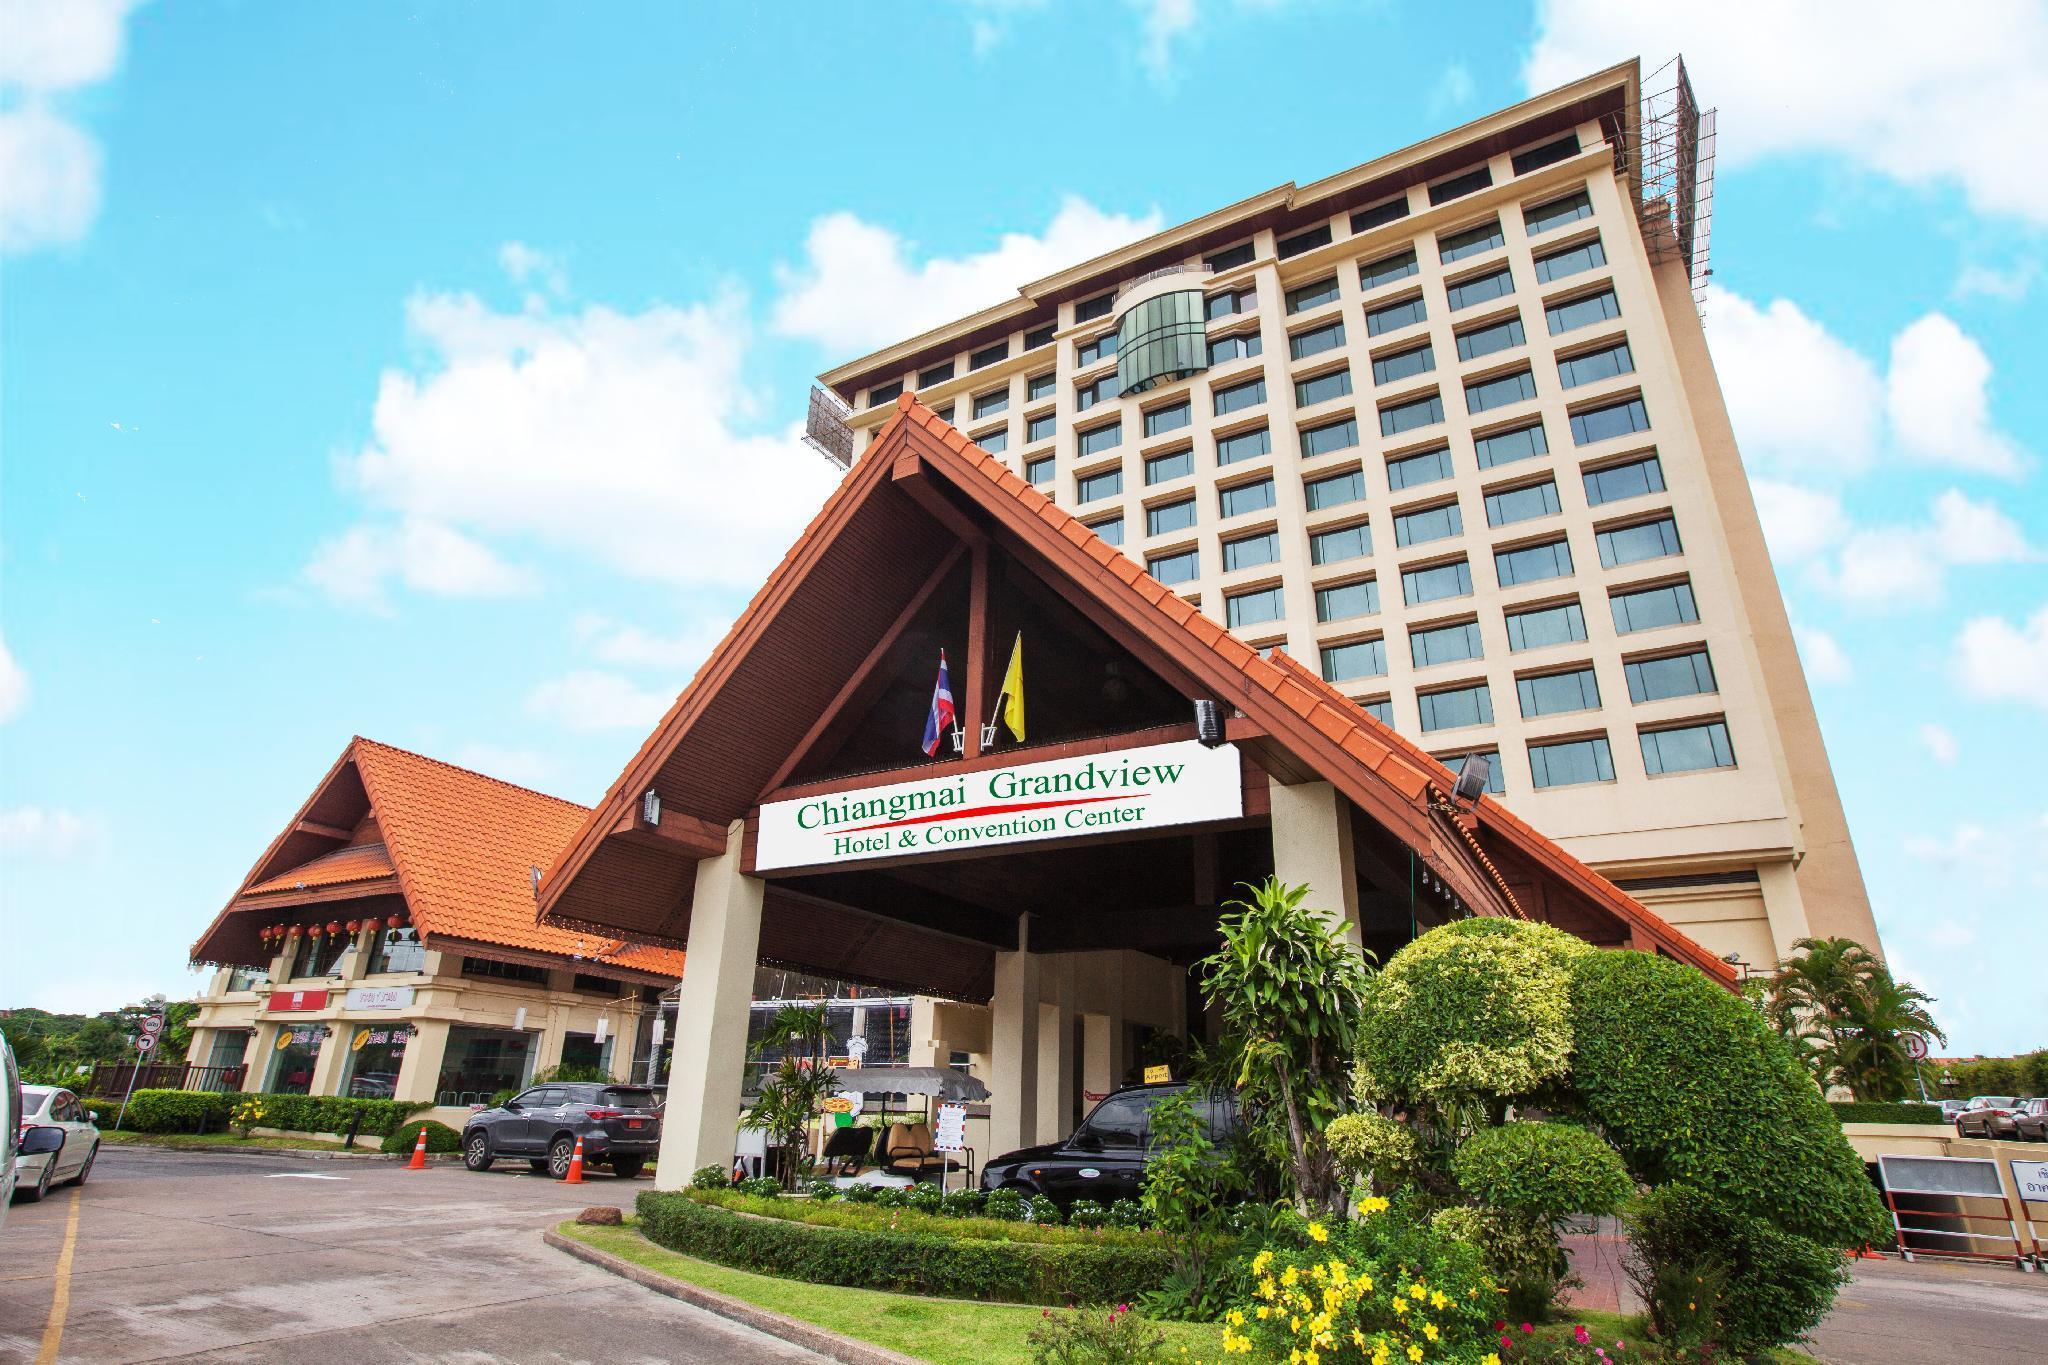 Chiangmai Grandview Hotel & Convention Center เชียงใหม่ แกรนด์วิว โฮเต็ล แอนด์ คอนเว็นชั่น เซ็นเตอร์